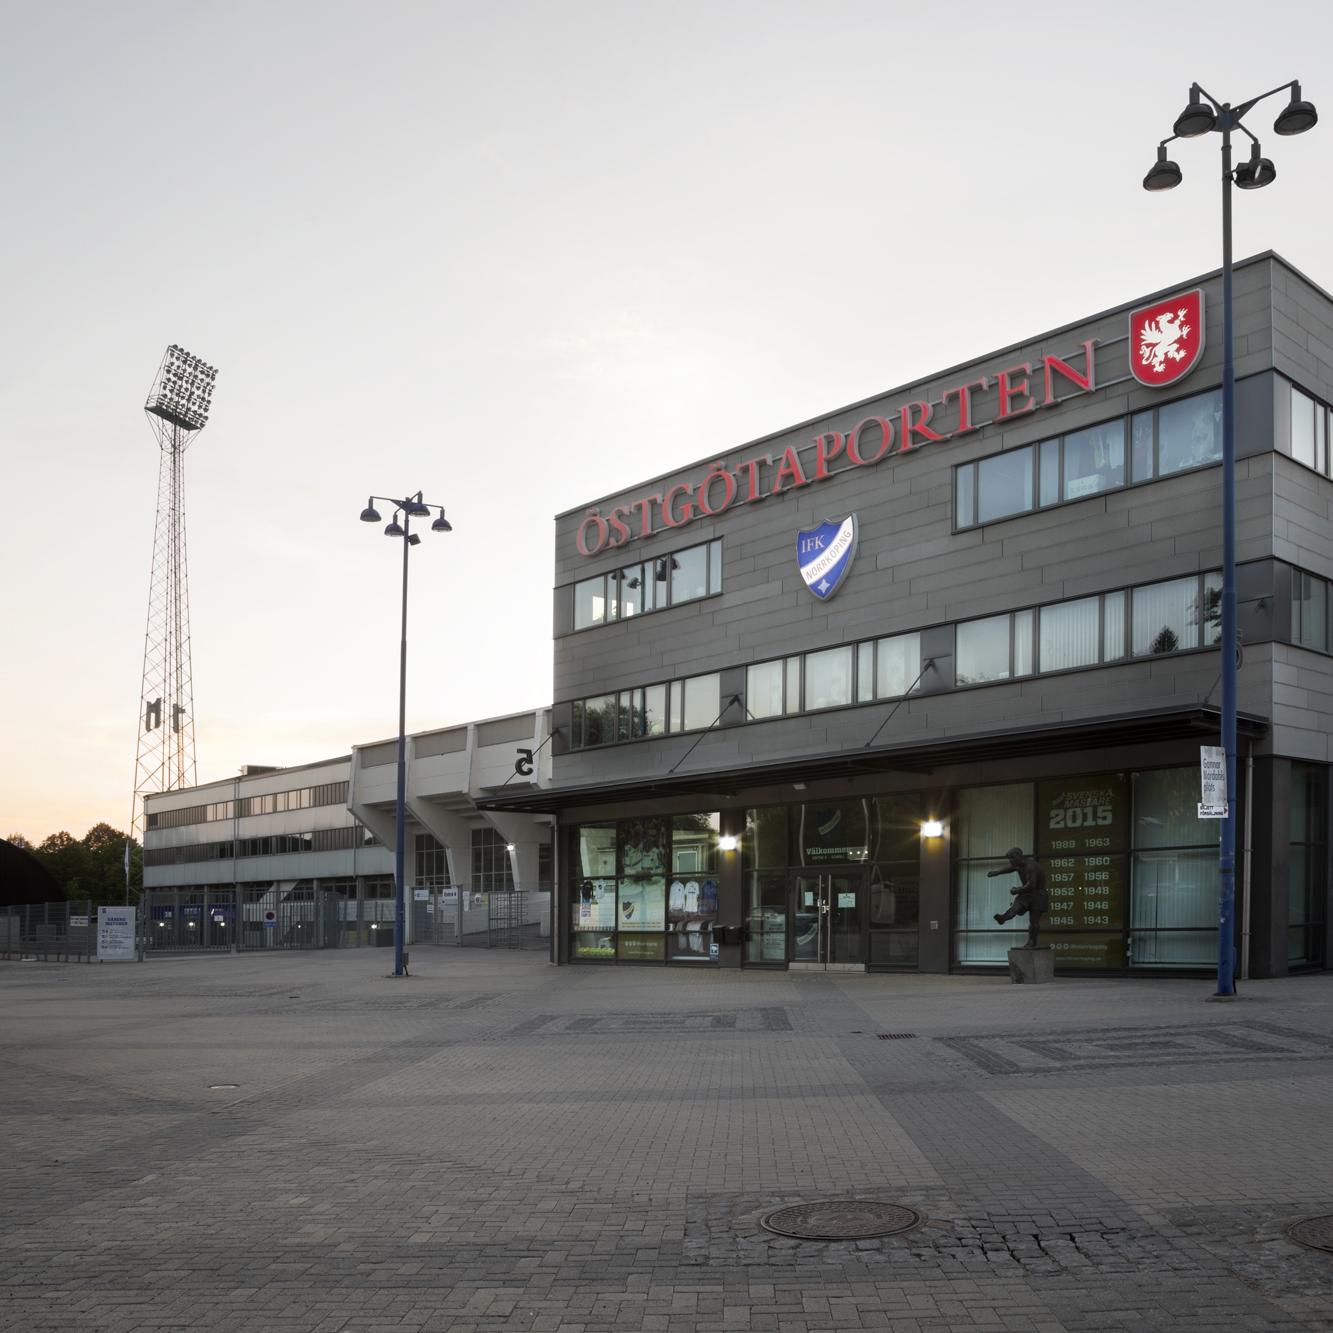 Östgötaporten, Norrköping